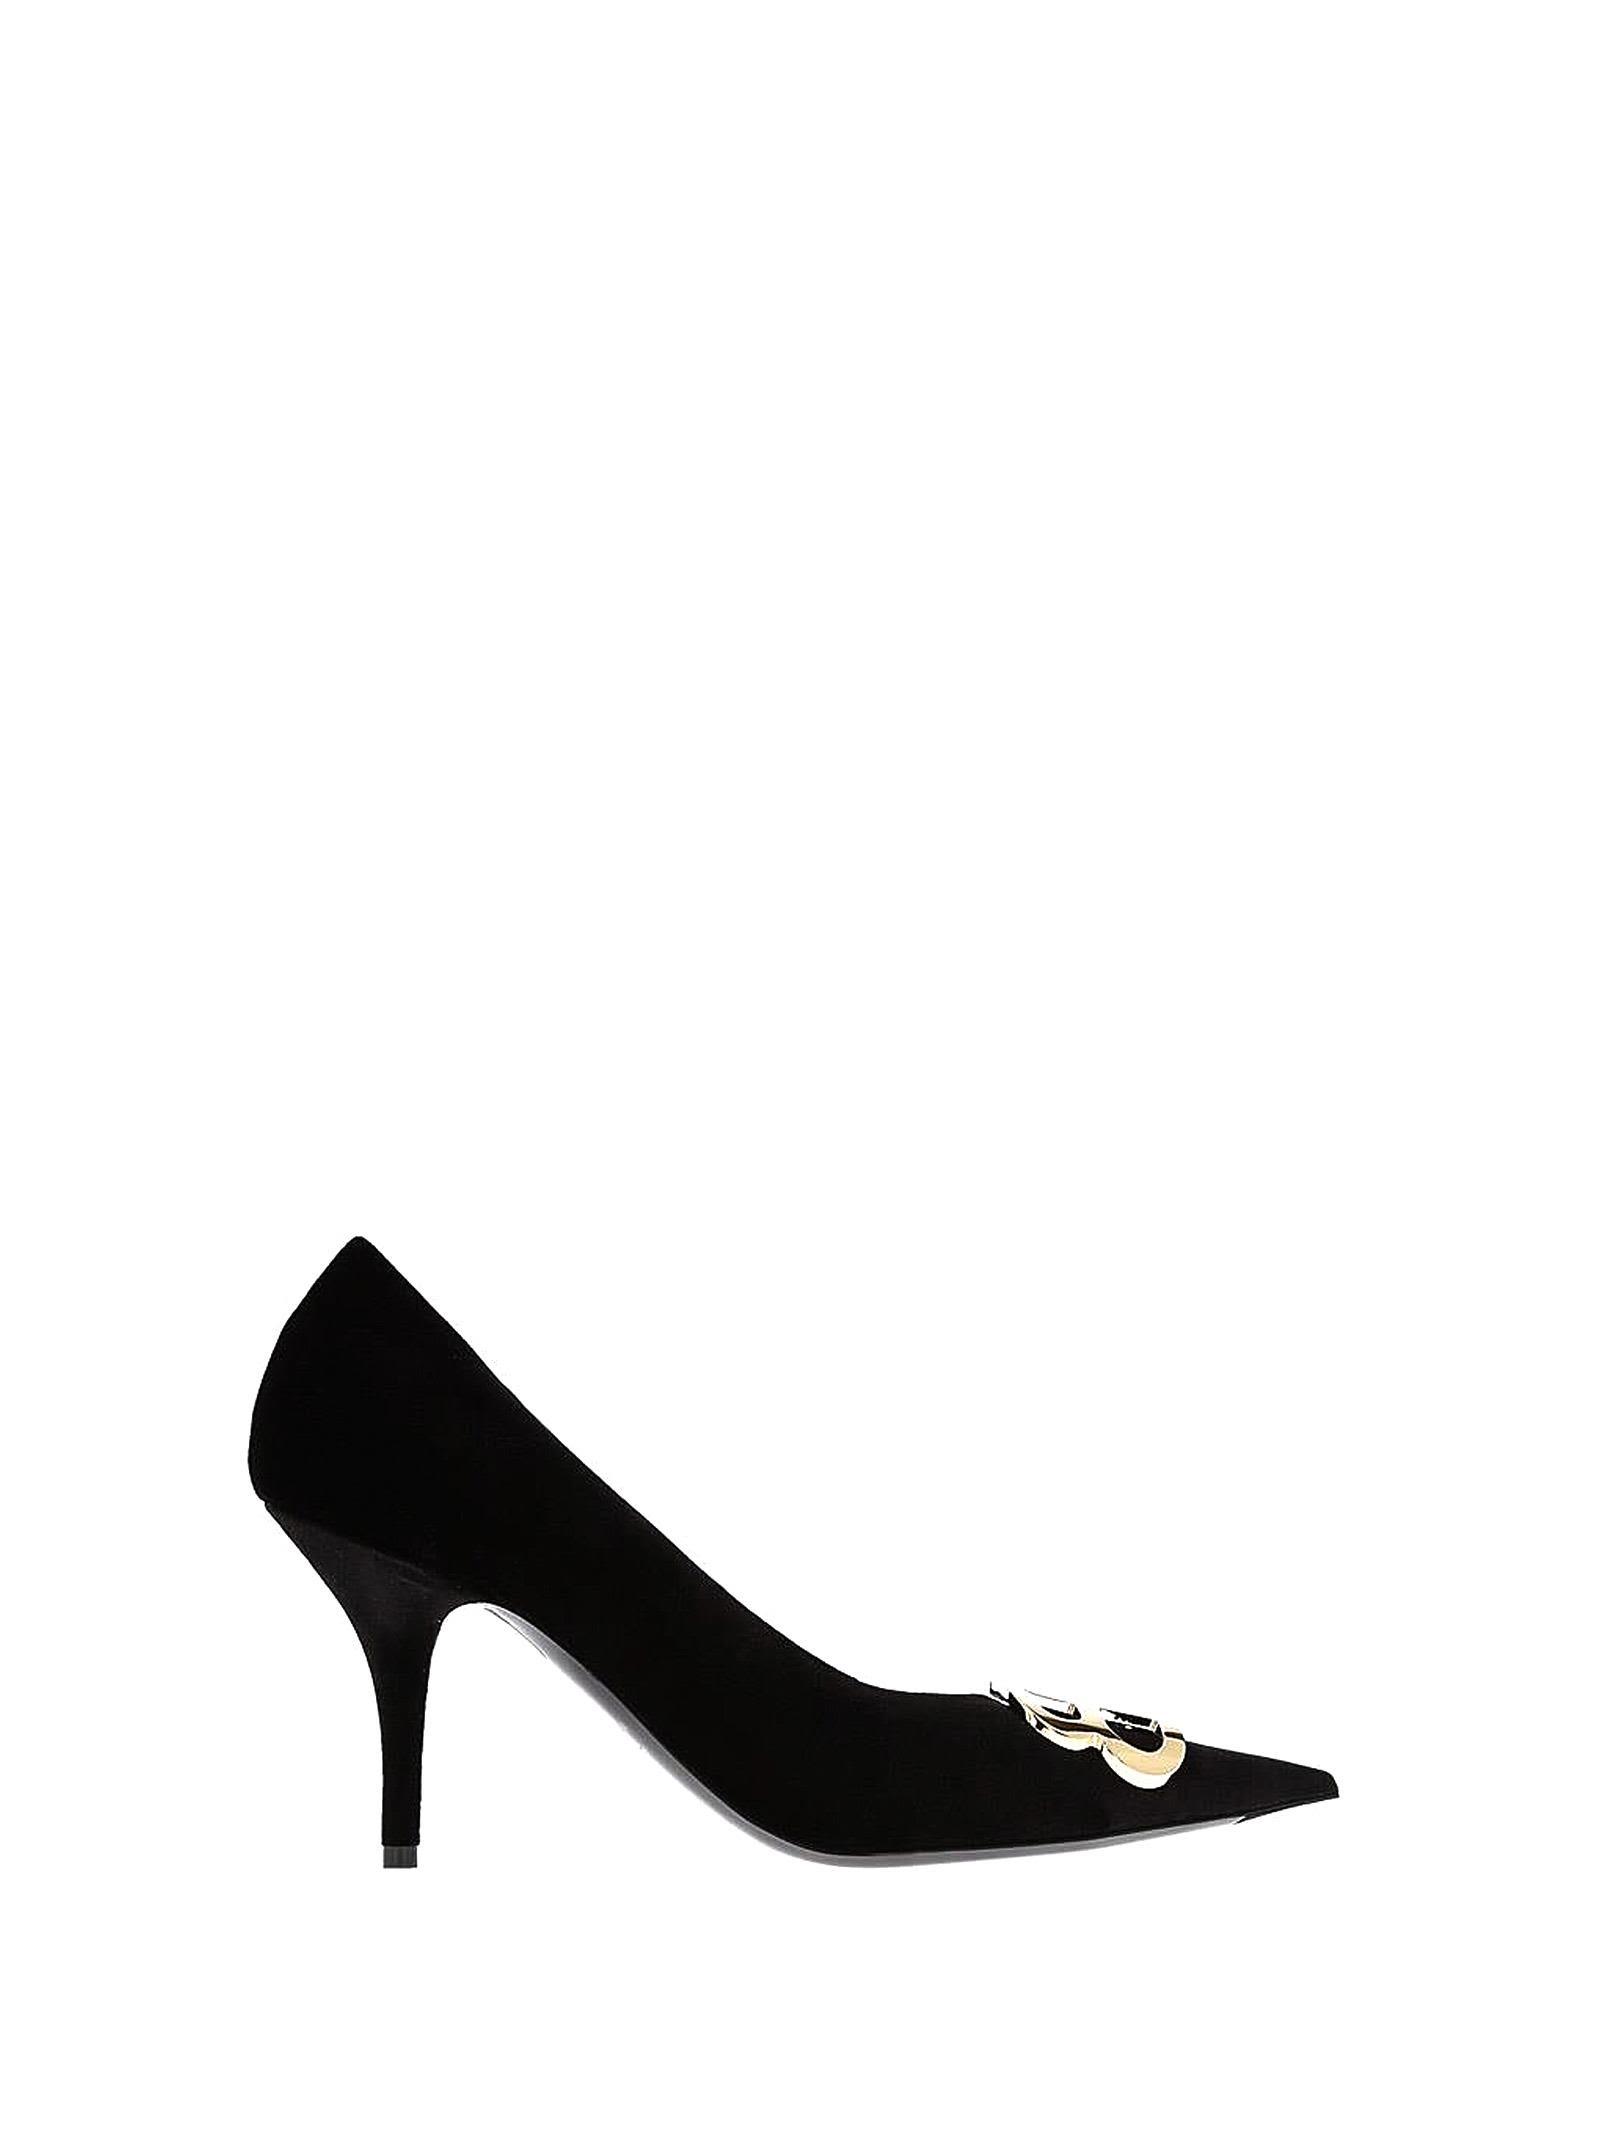 b4ea6a48bb0 Balenciaga Bb Black Velvet Pumps In Noir